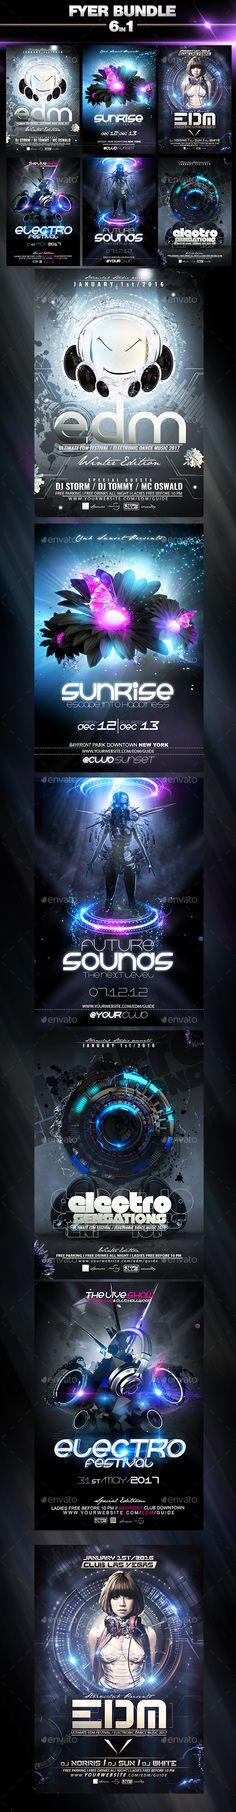 Party Flyer Electro Bundle V3  PSD Template • Get it now! ➝ https://graphicriver.net/item/party-flyer-electro-bundle-v3/13506684?ref=pxcr